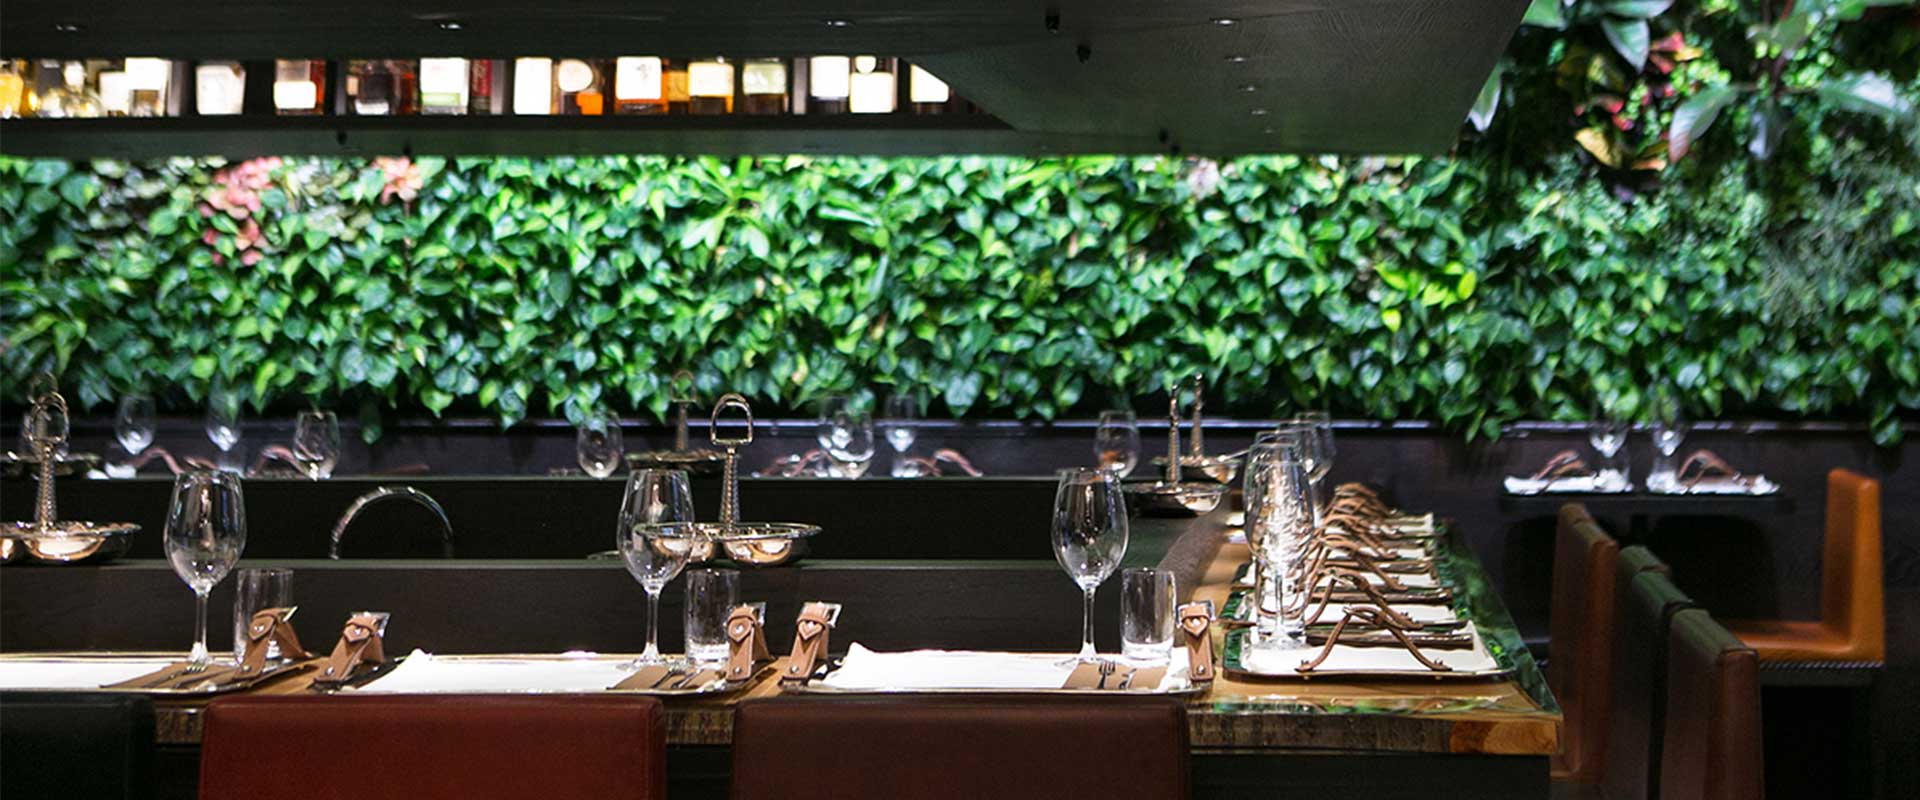 tartufi-milano-ristorante